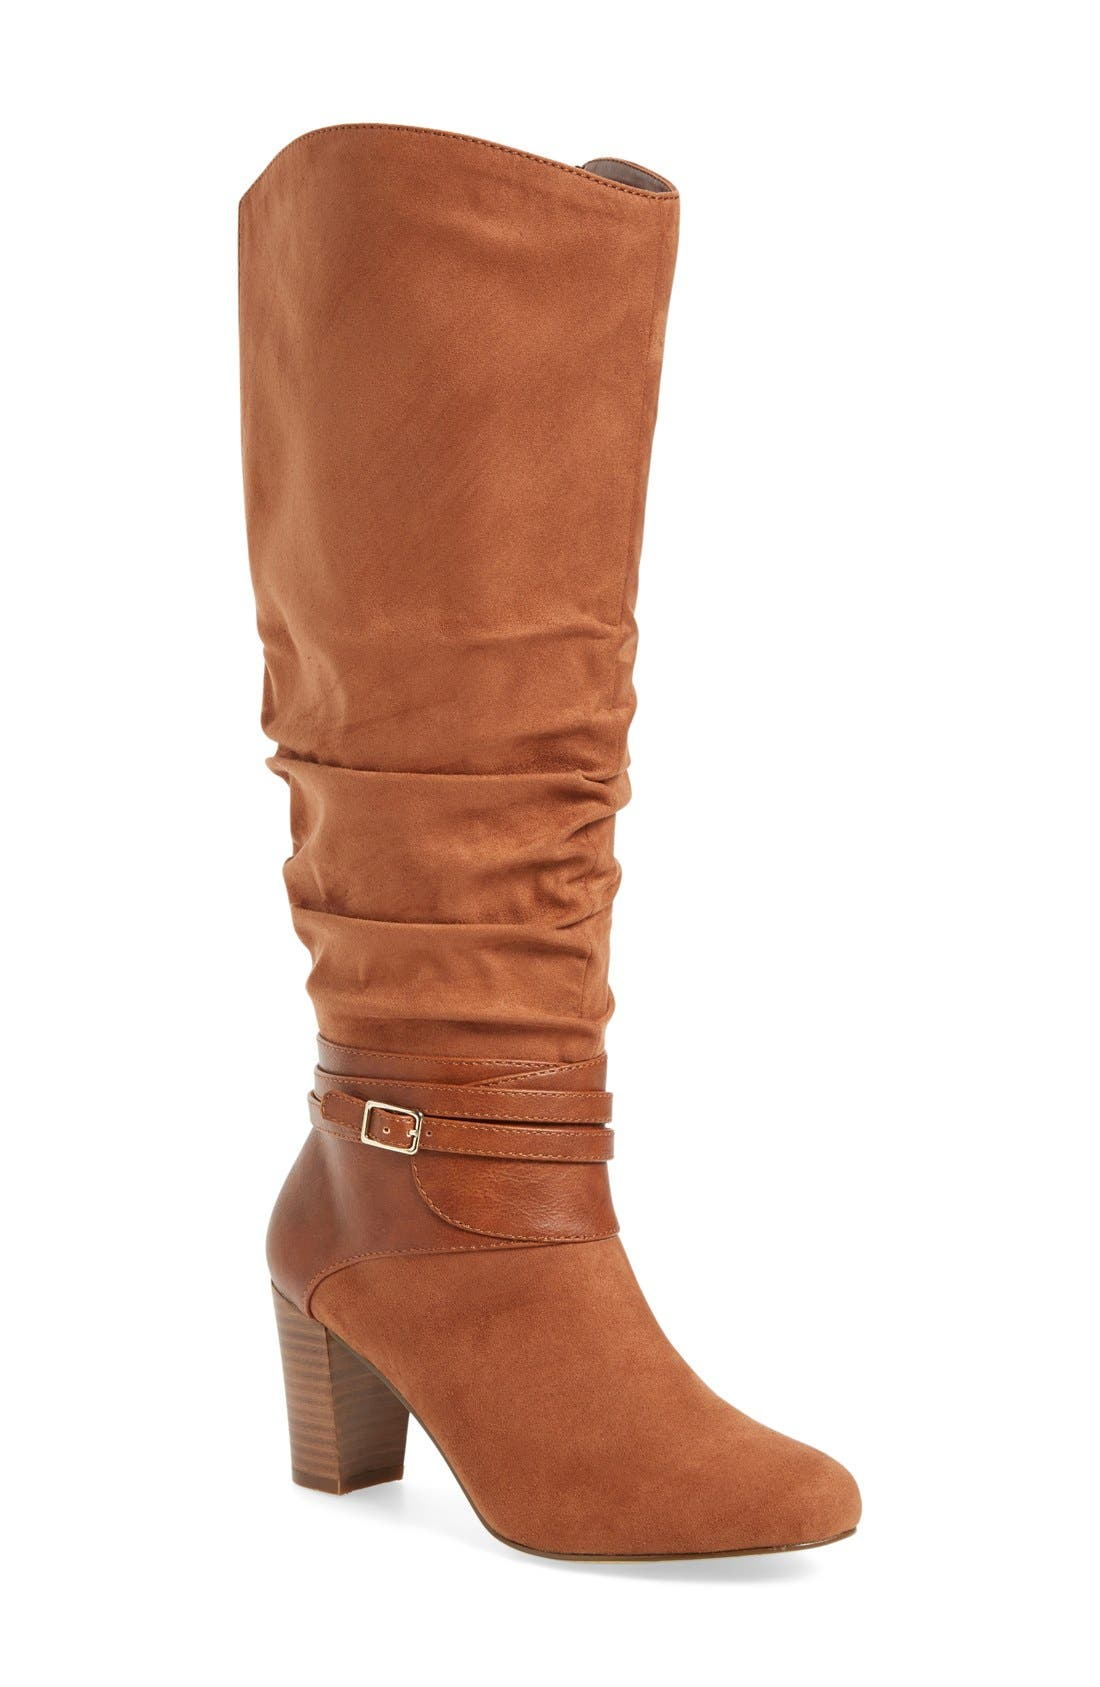 Main Image - Bella Vita 'Tabitha II' Tall Boot (Women) (Wide Calf)